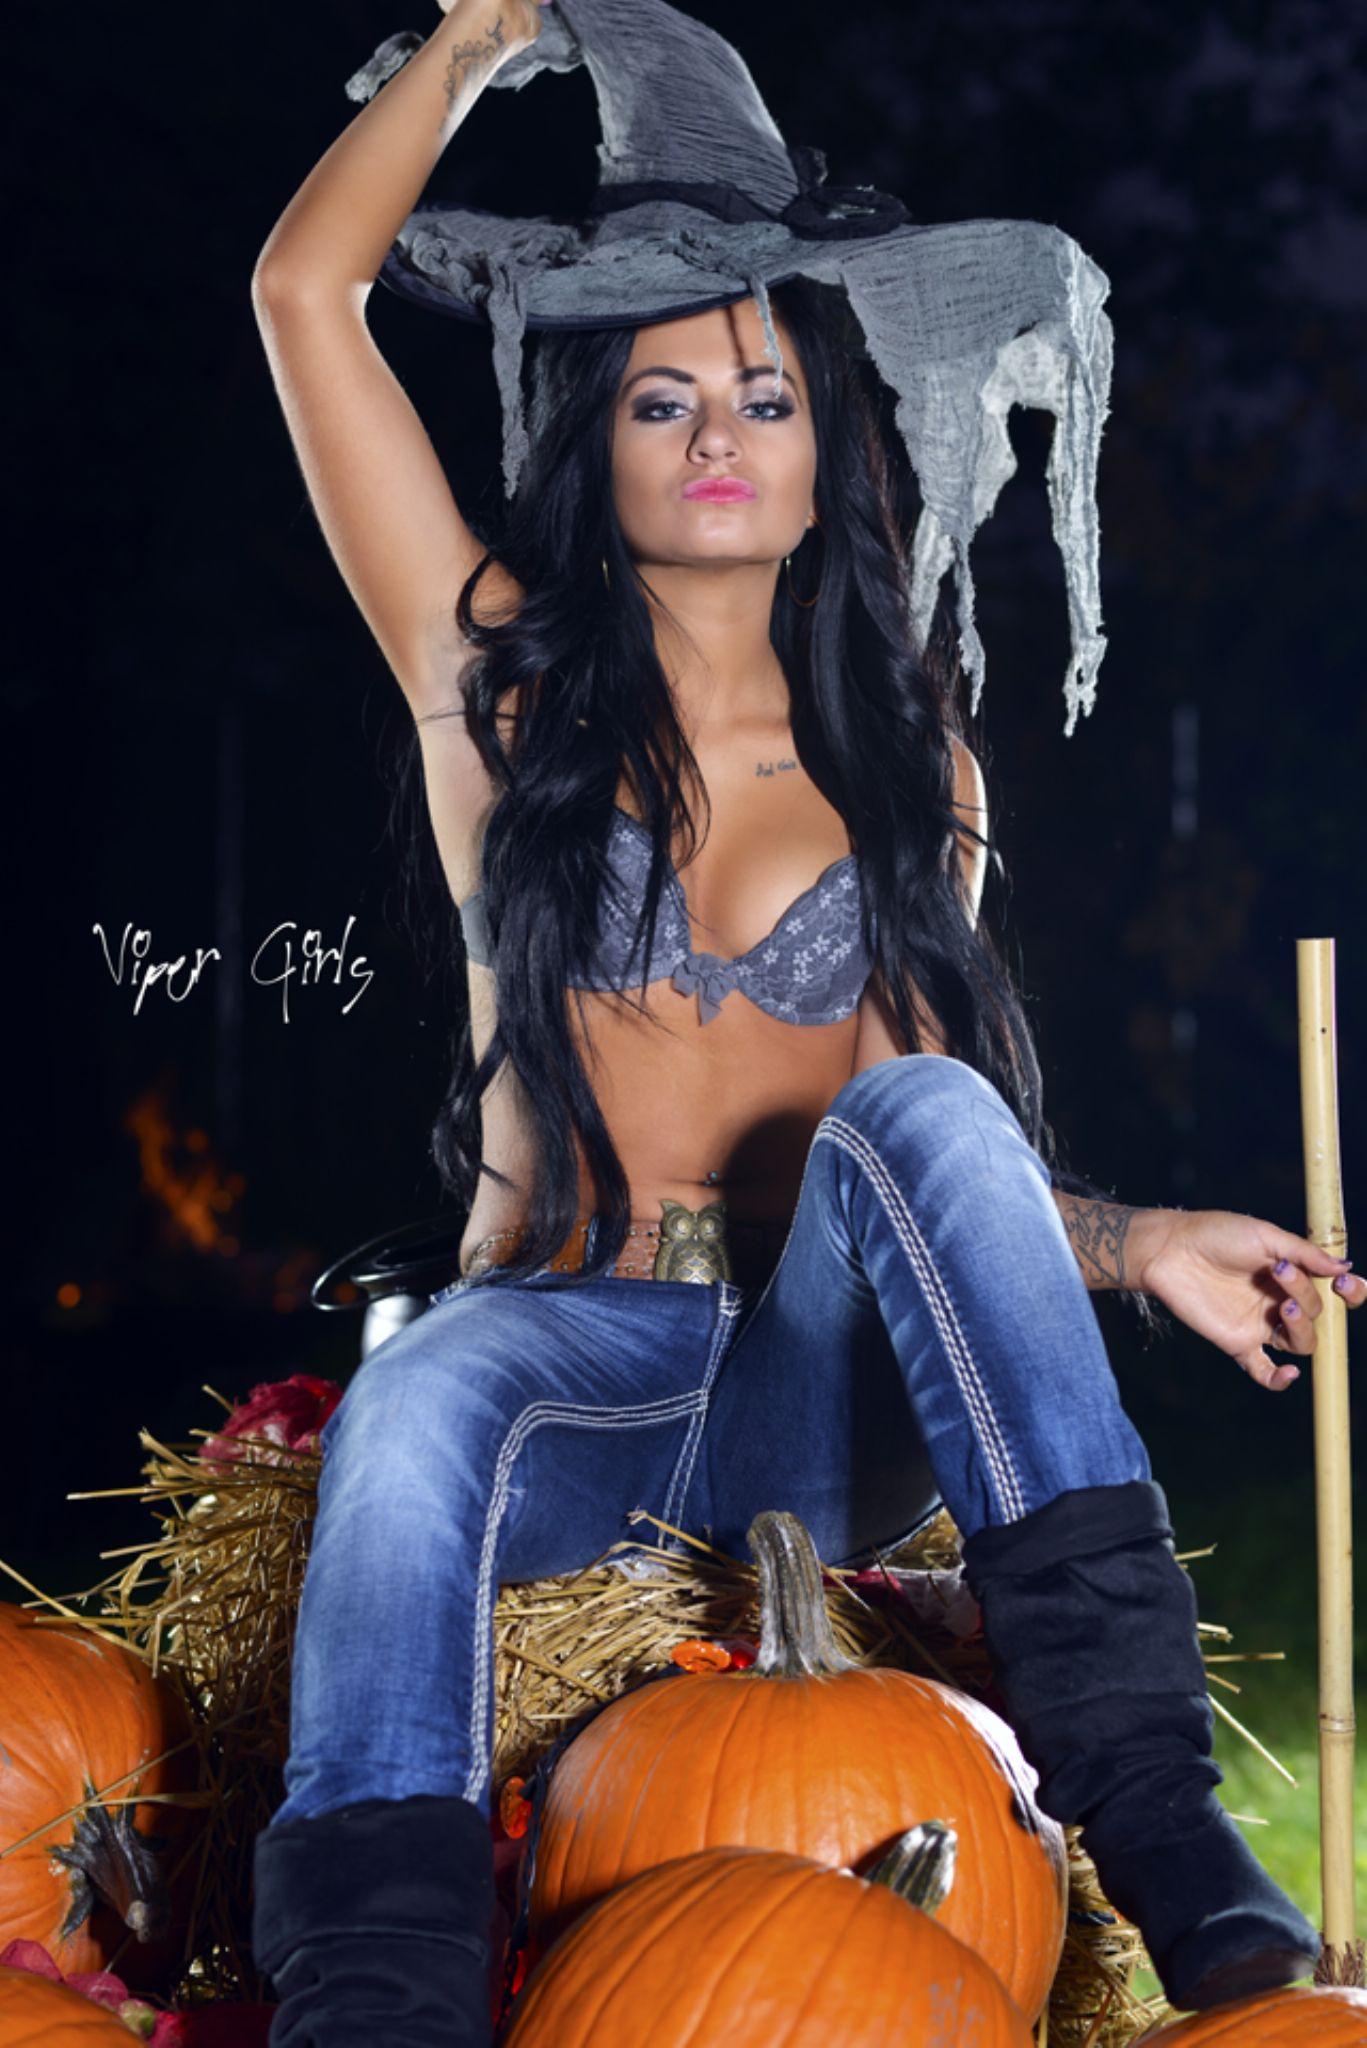 Halloween Hottie by Brian Sadowski